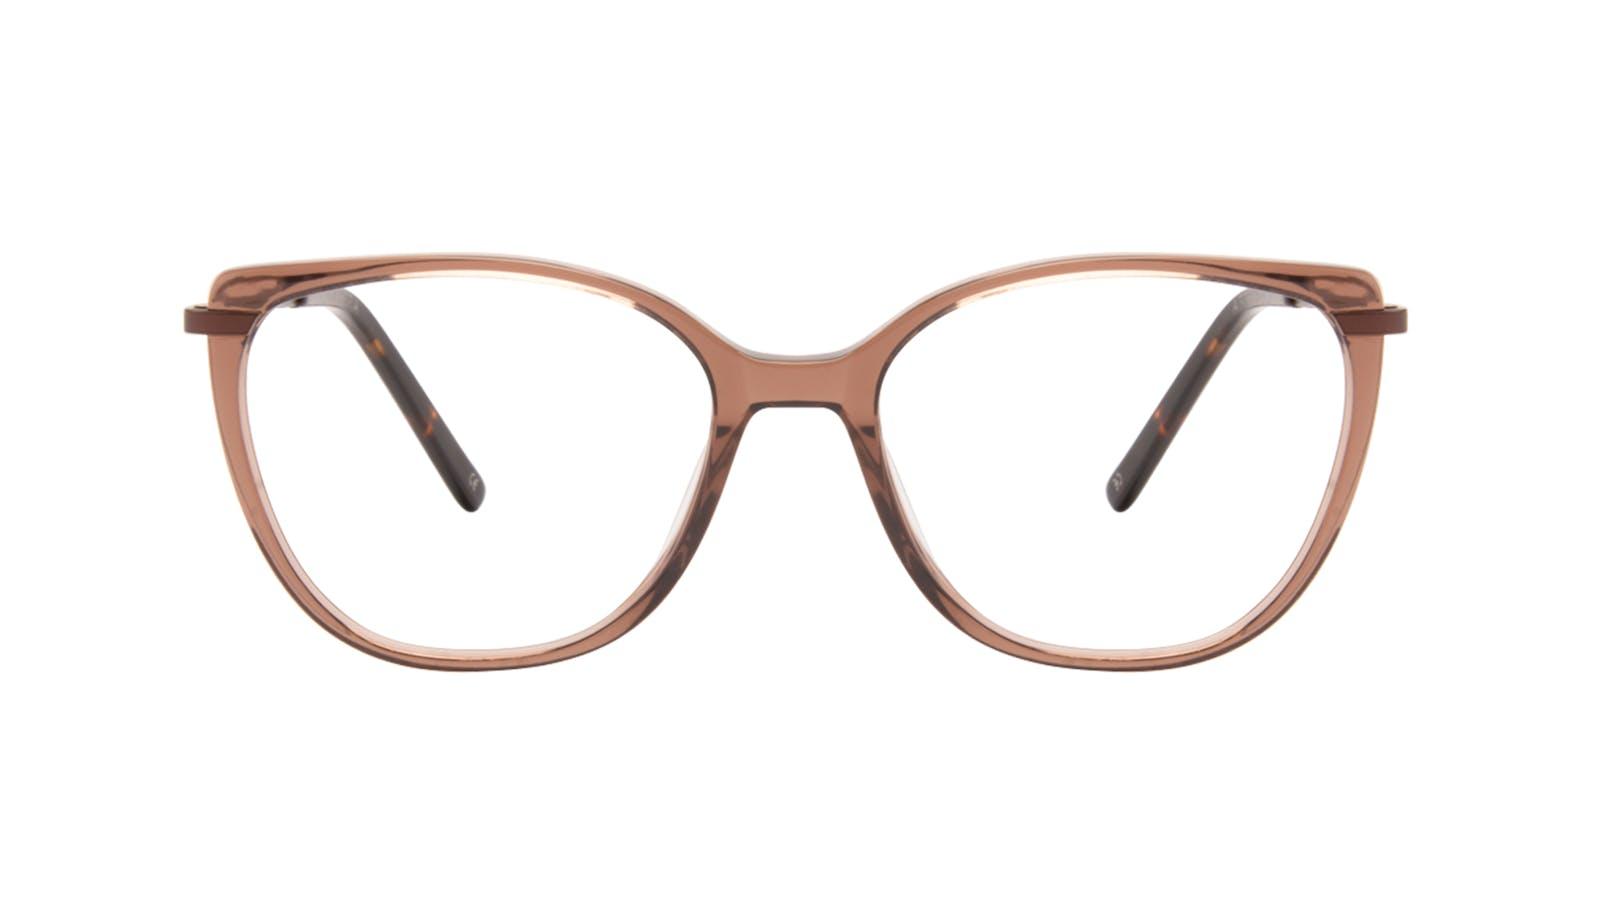 women\'s Fashion Eyeglasses: Affordable Eyewear For women   Bonlook